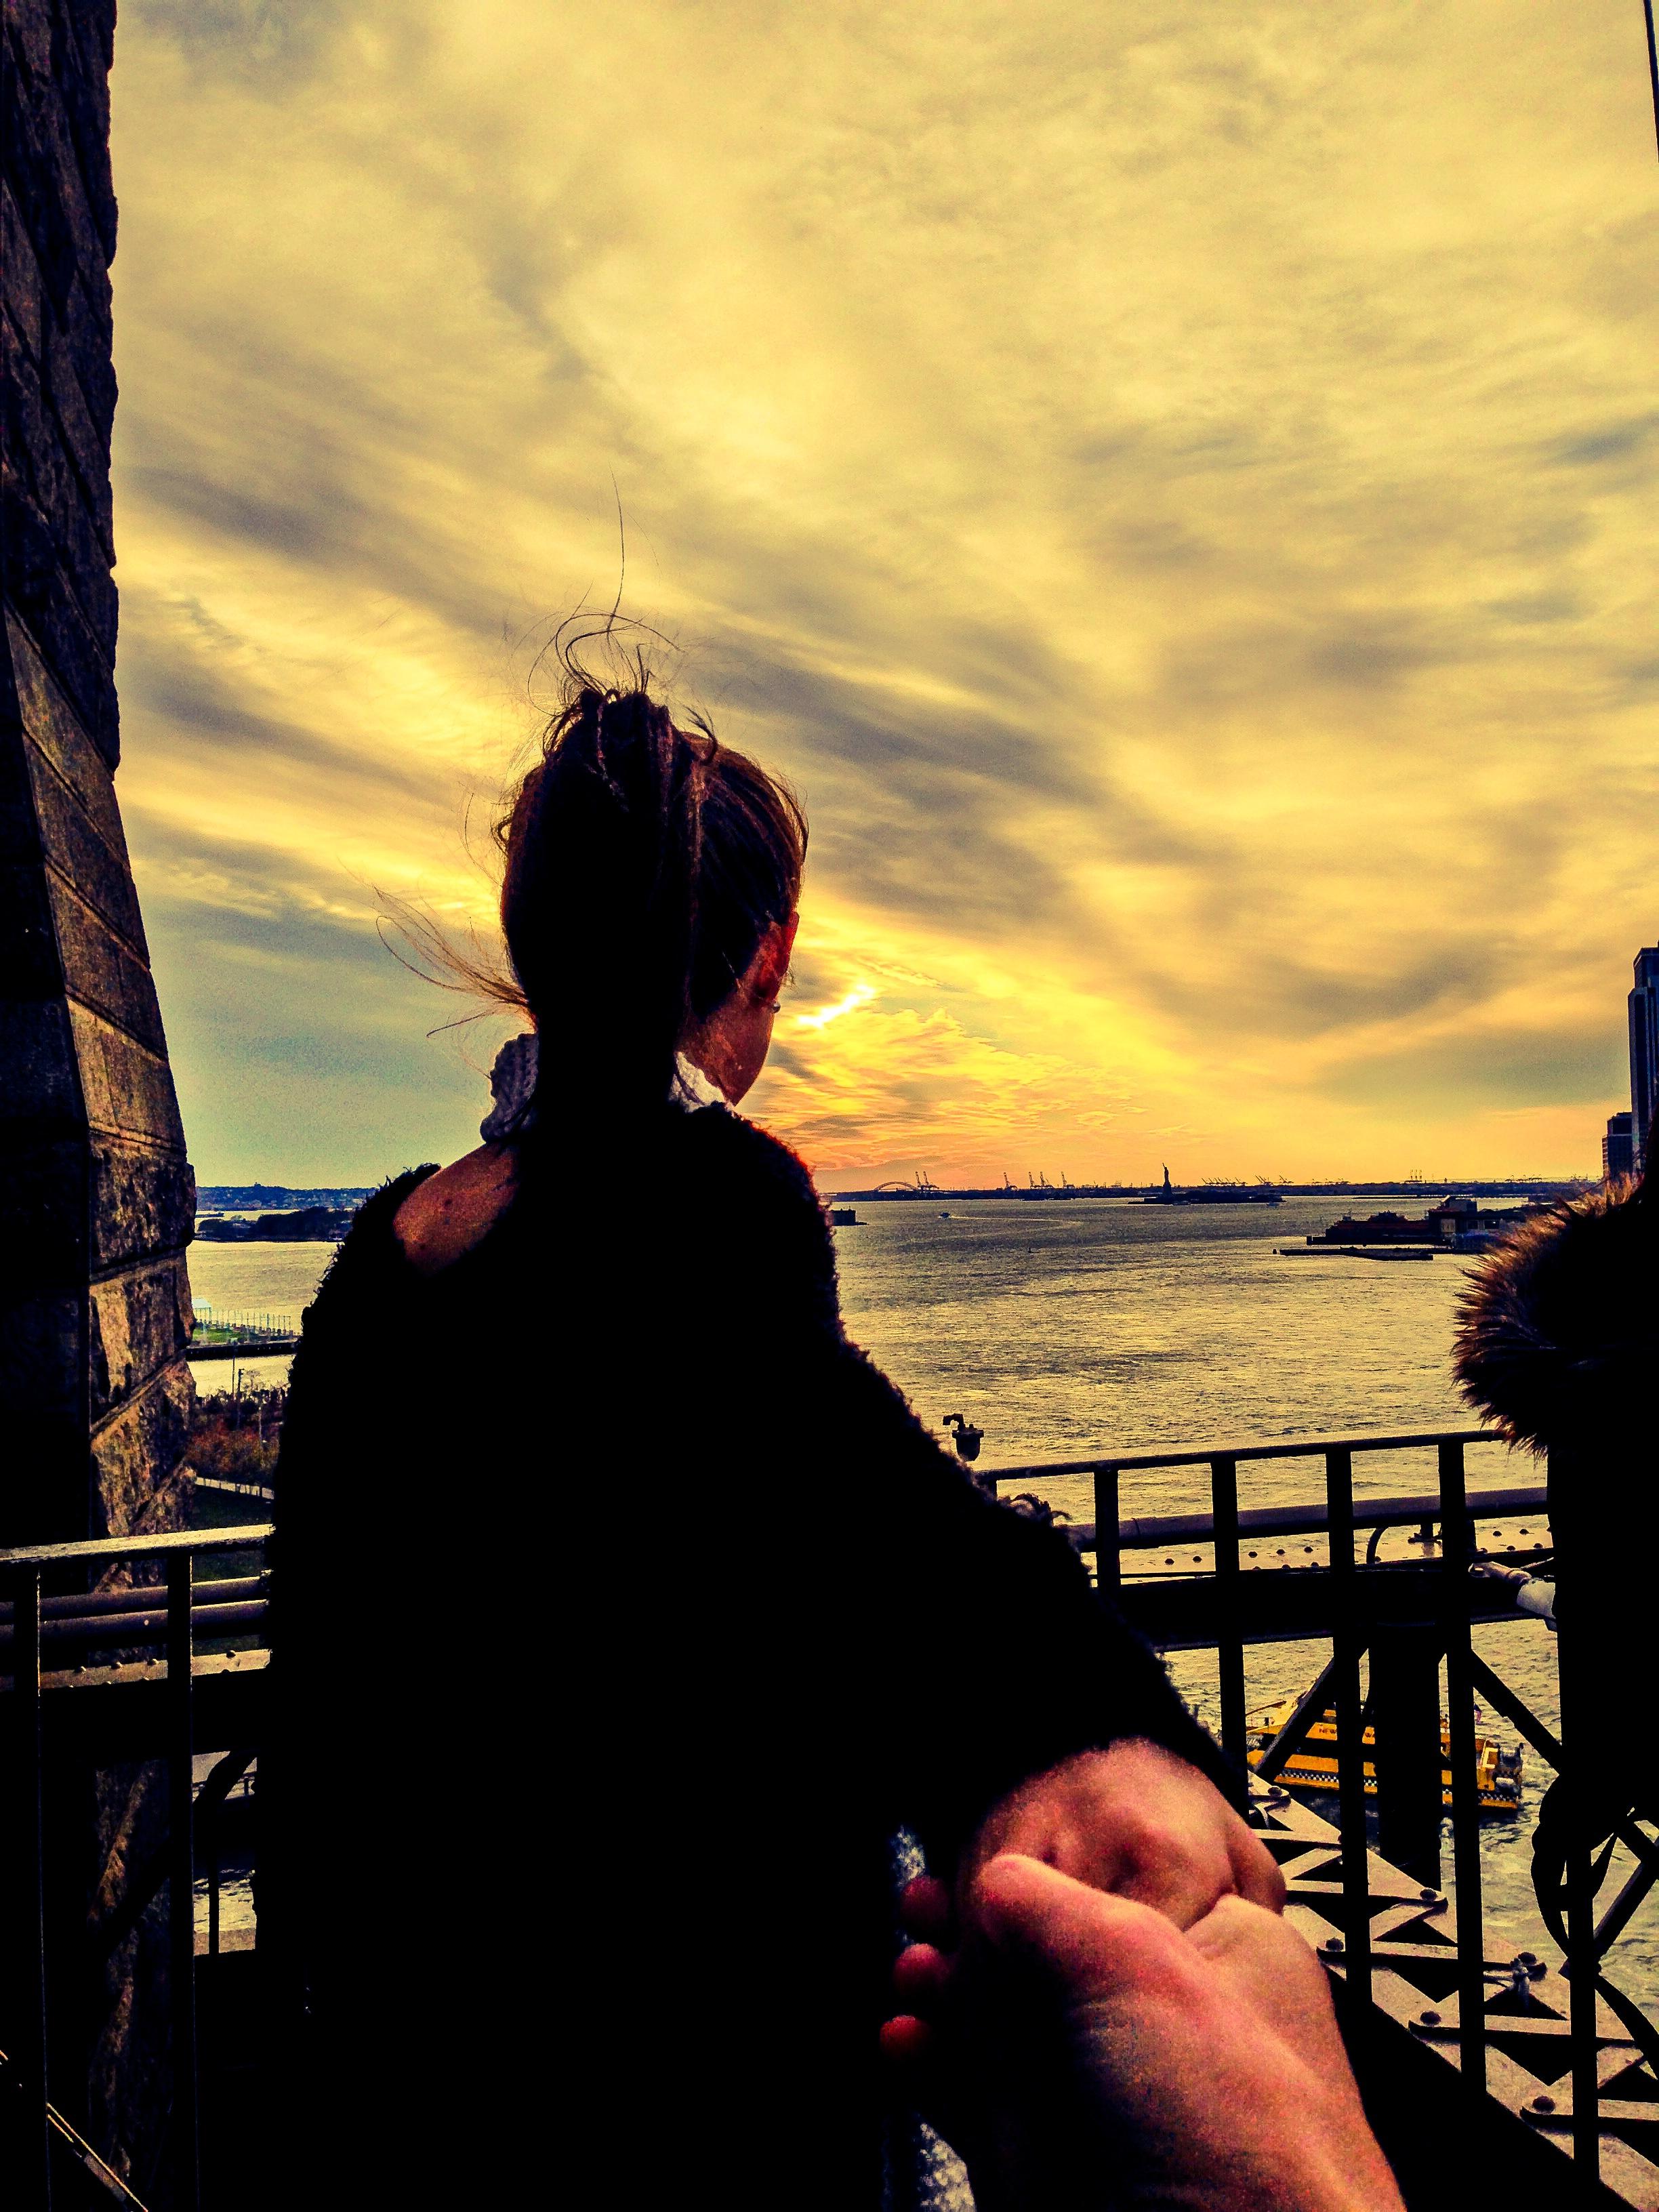 Brooklyn Bridge | Statue of Liberty at Far